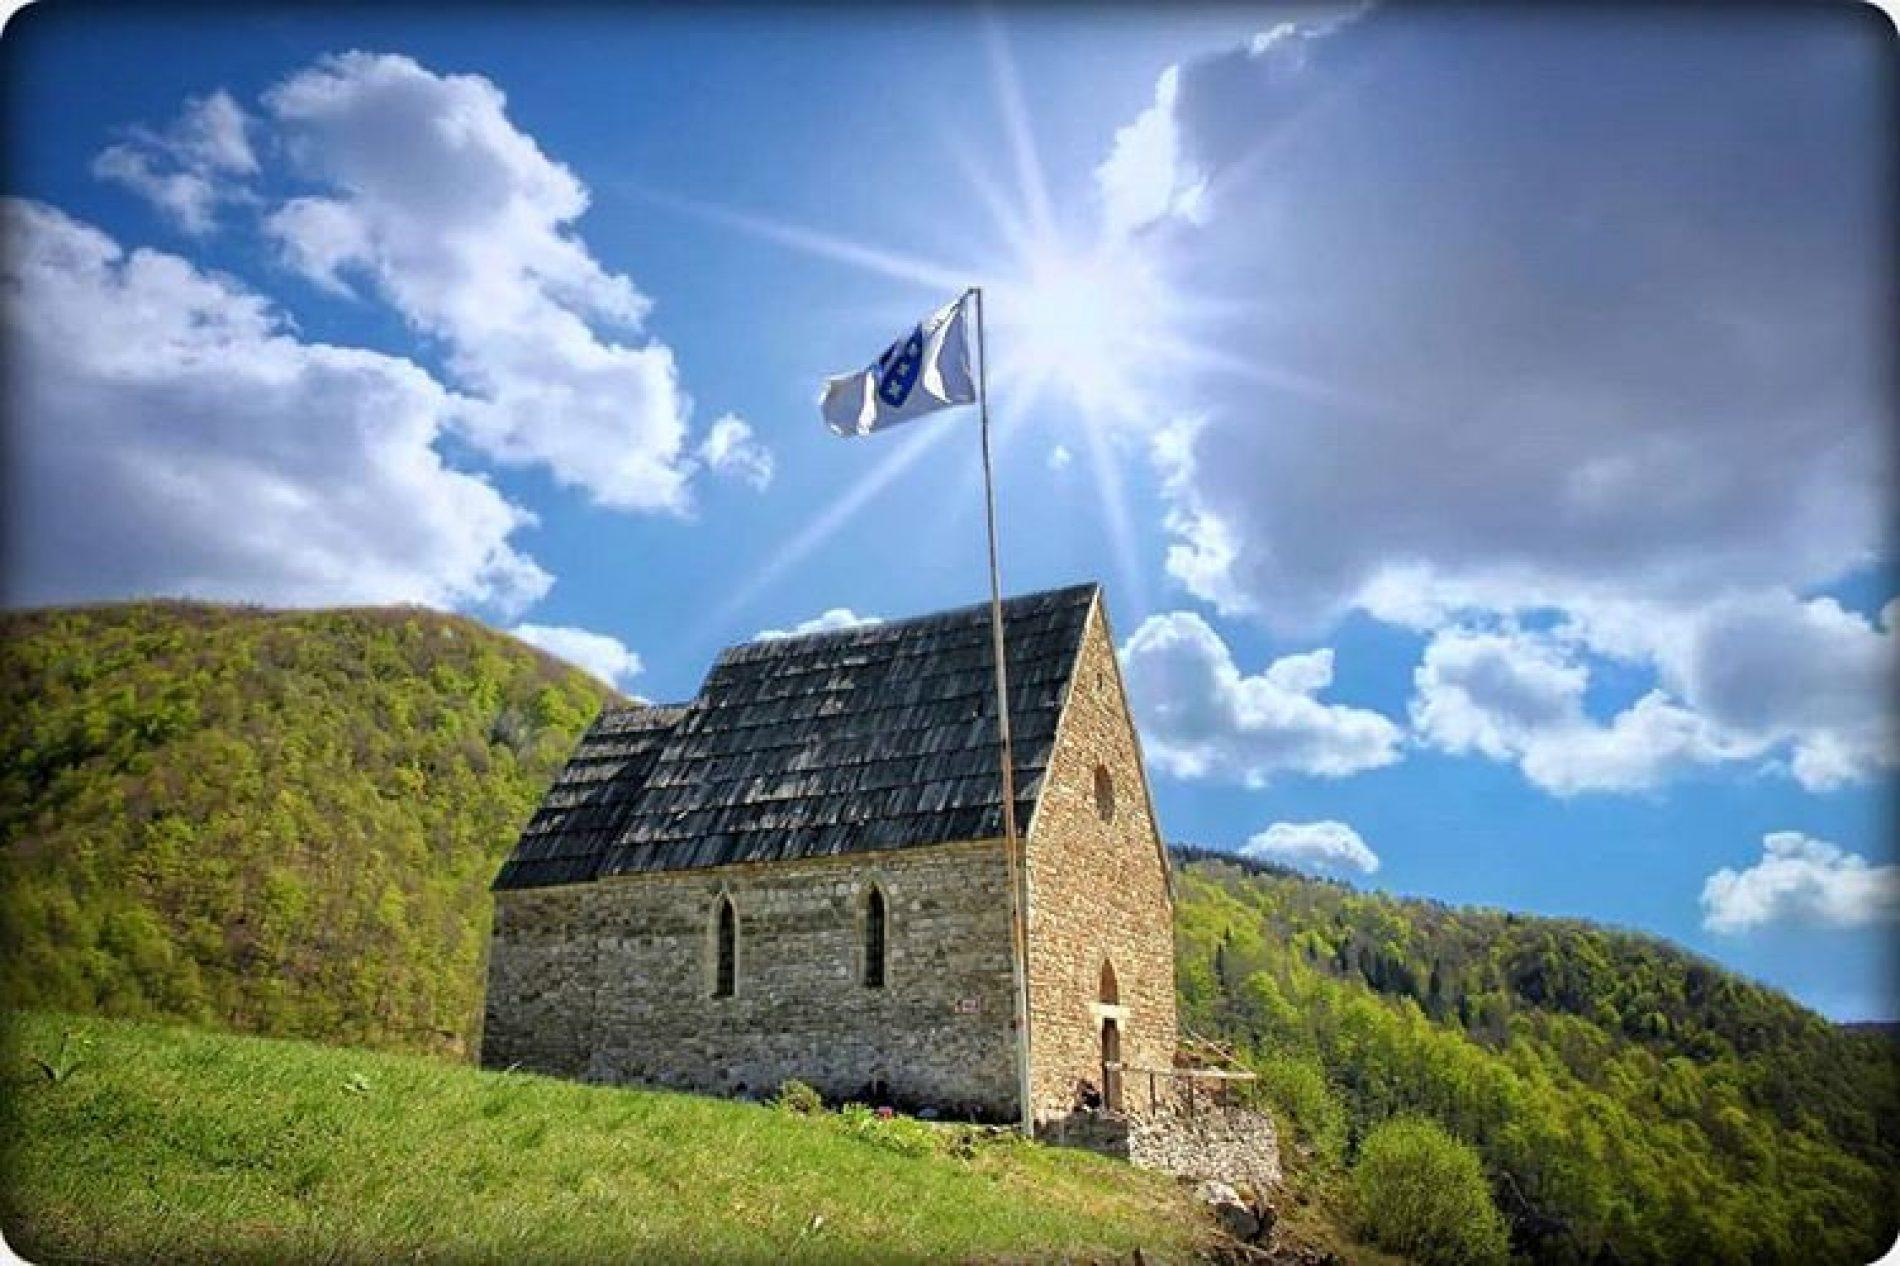 Projektom 'Kraljeva brda' povezati i oživjeti značajne lokacije srednjovjekovne bosanske države